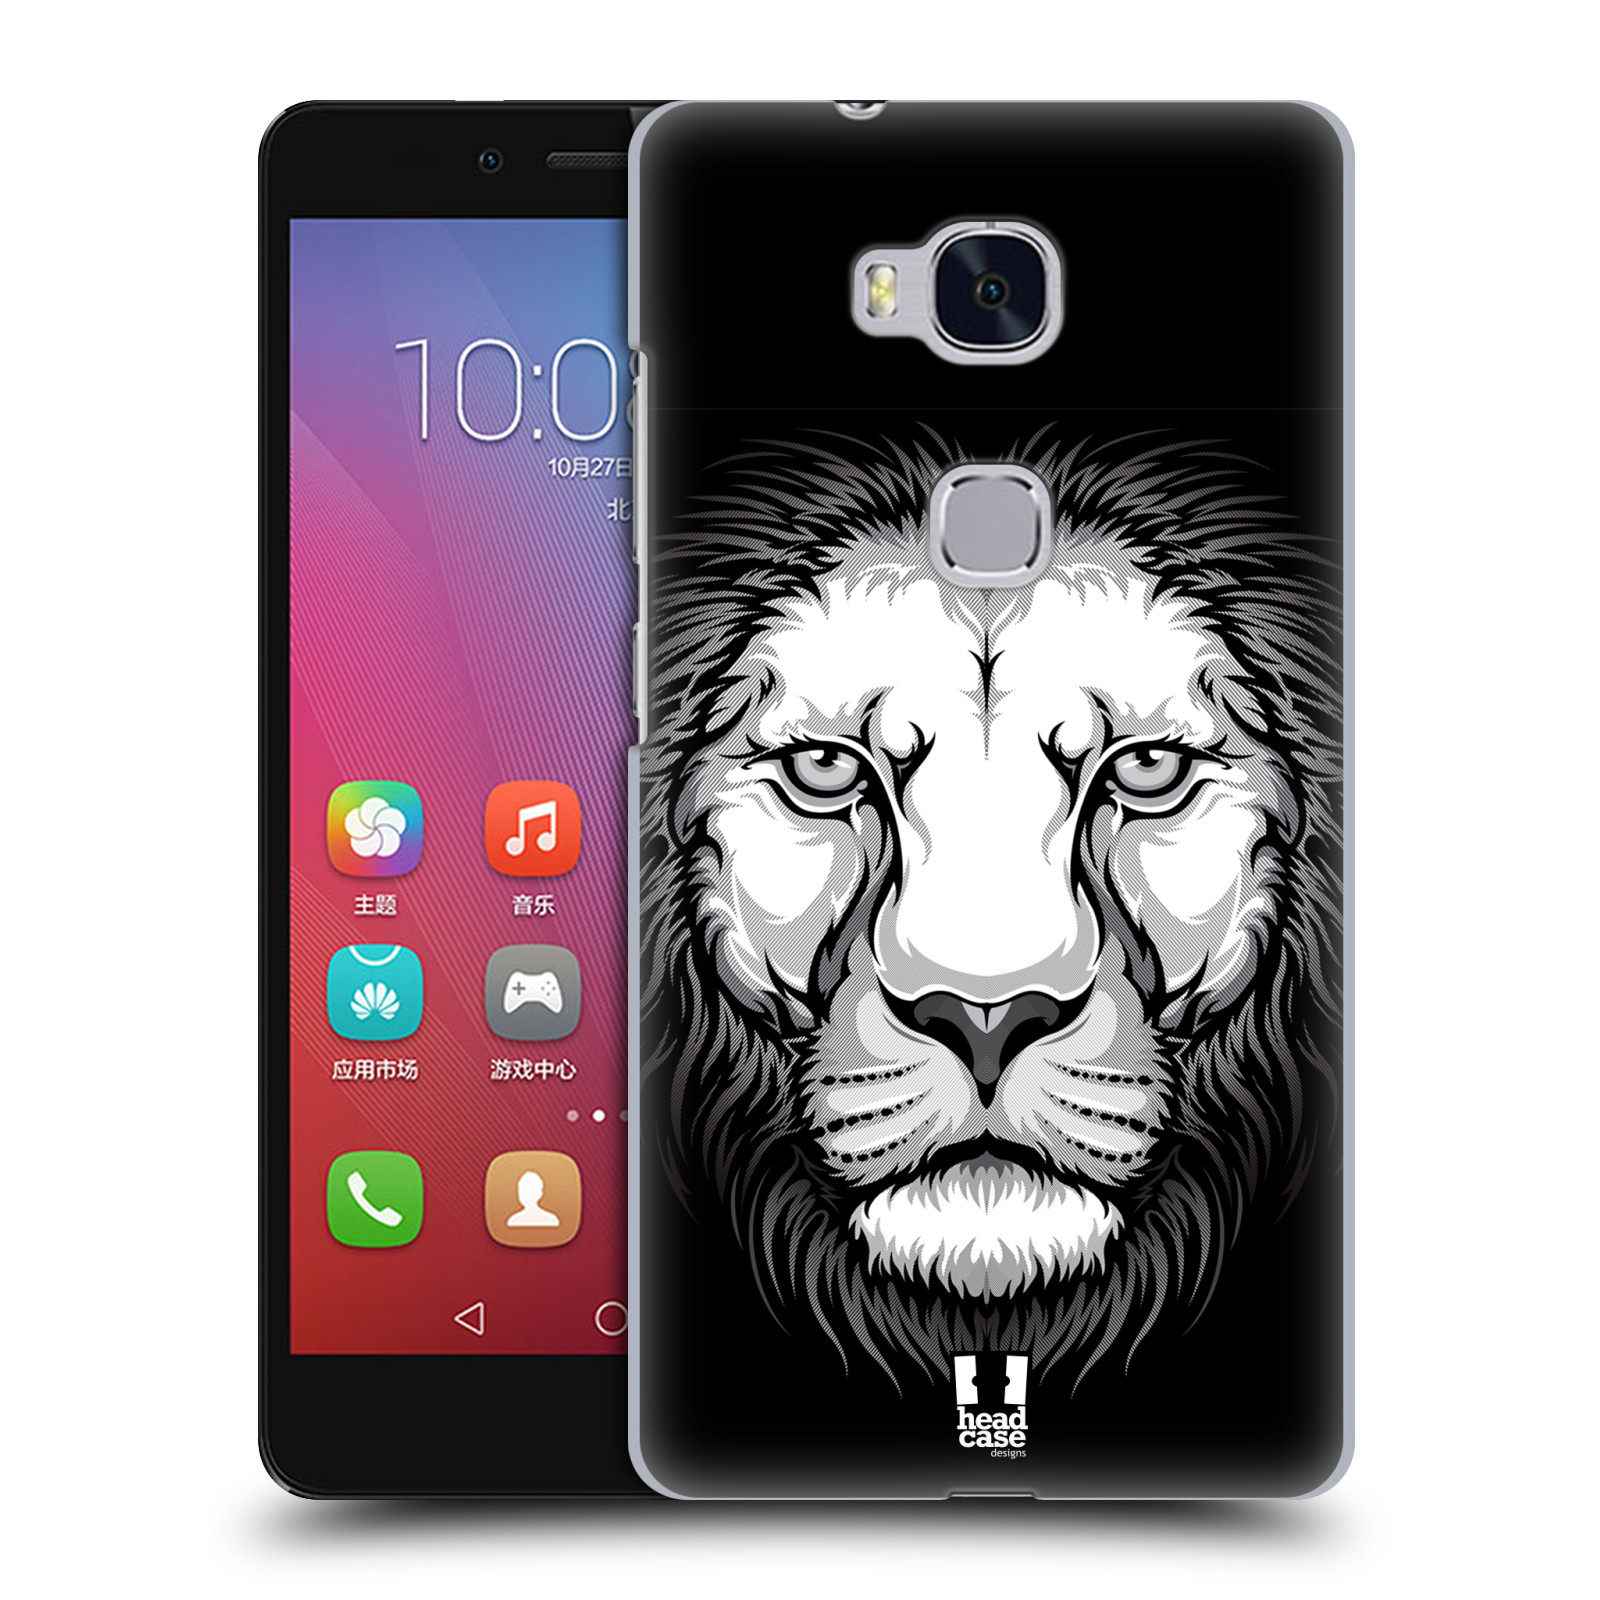 HEAD CASE pevný plastový obal na mobil HUAWEI HONOR 5X vzor Zvíře kreslená tvář lev